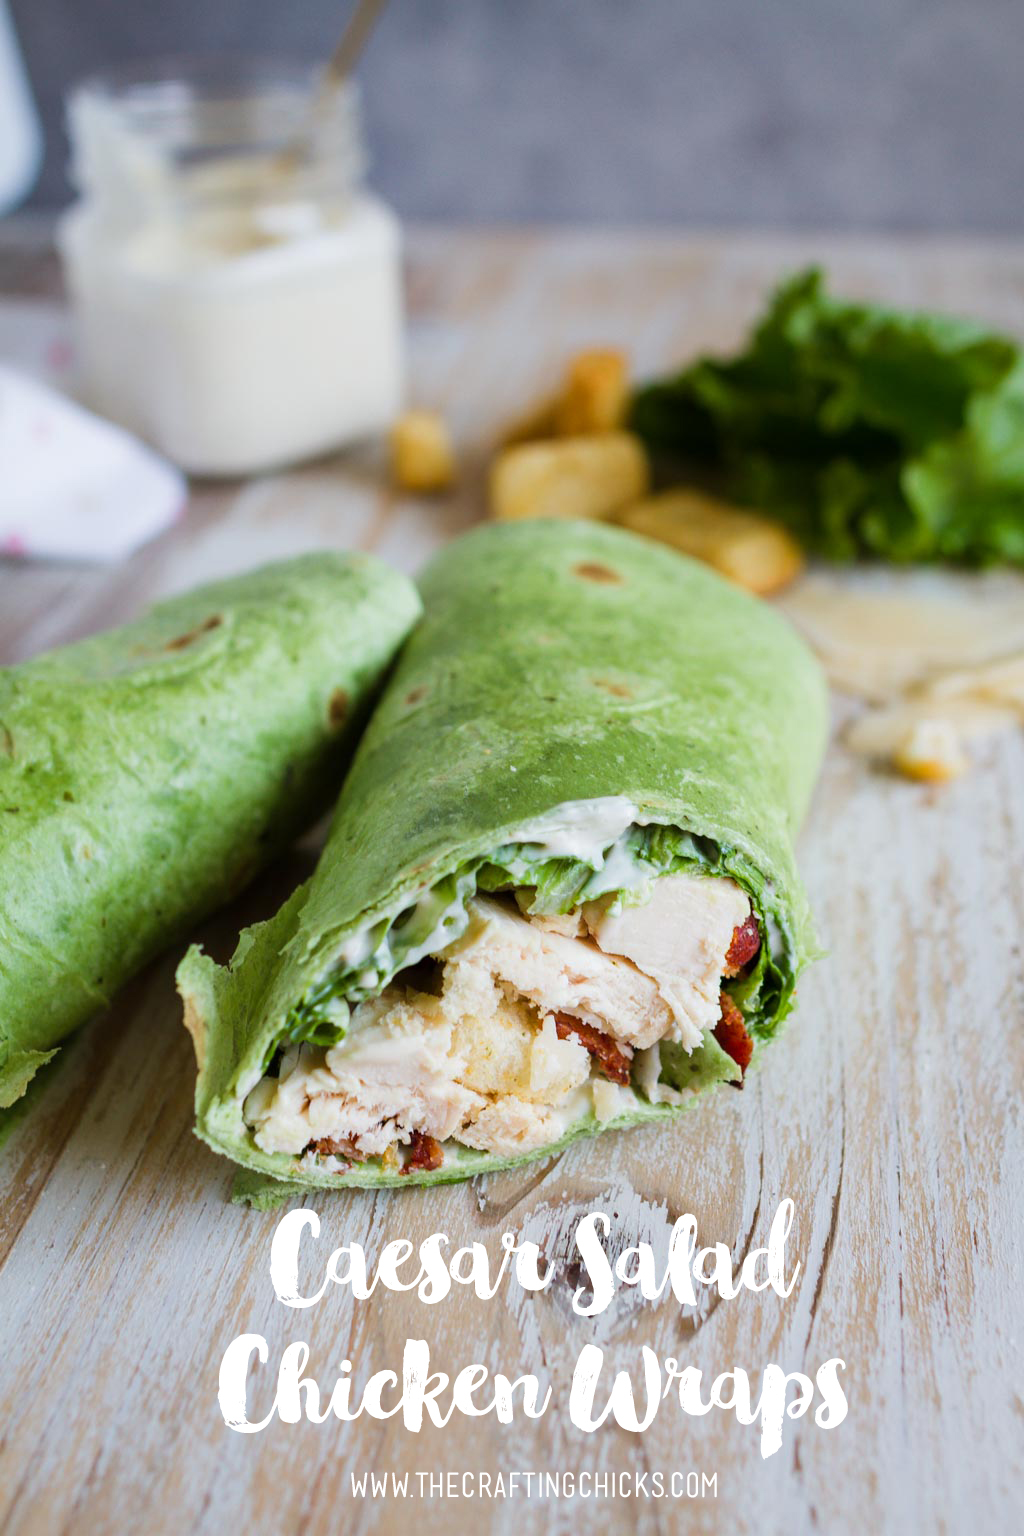 Casear Salad Chicken Wrap